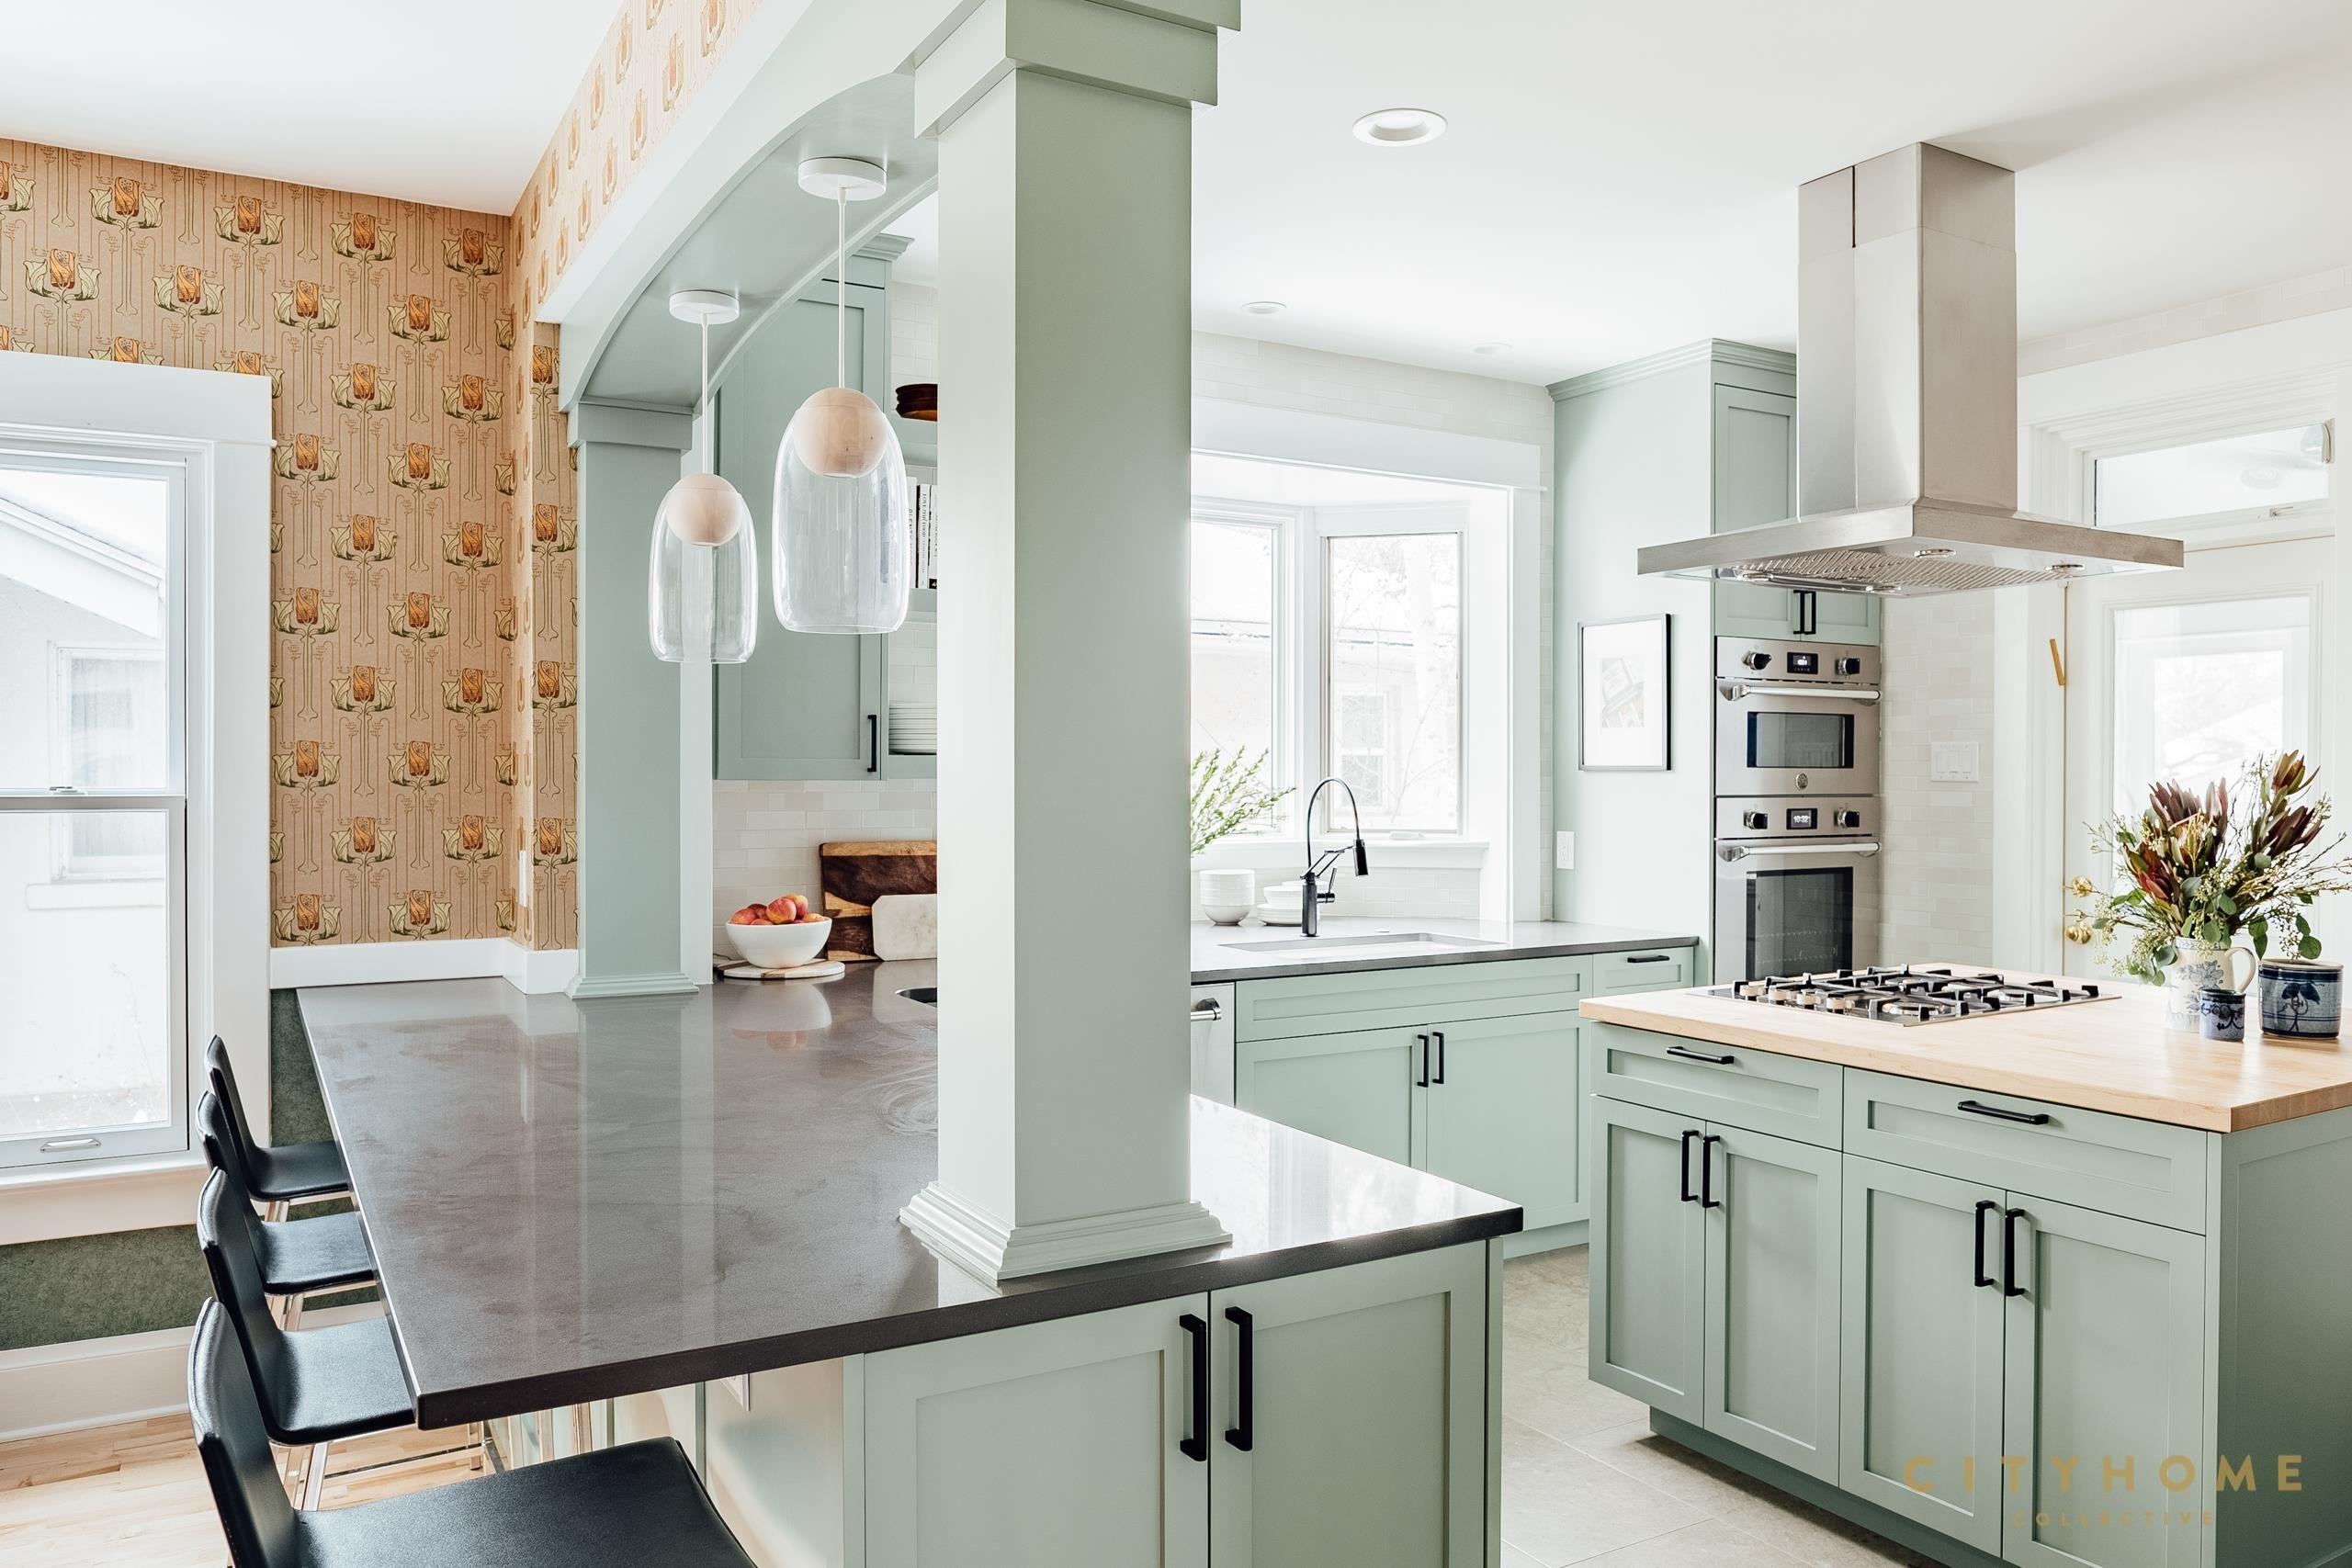 interior design cityhomecollective with images mint green kitchen kitchen inspiration on kitchen interior green id=37585